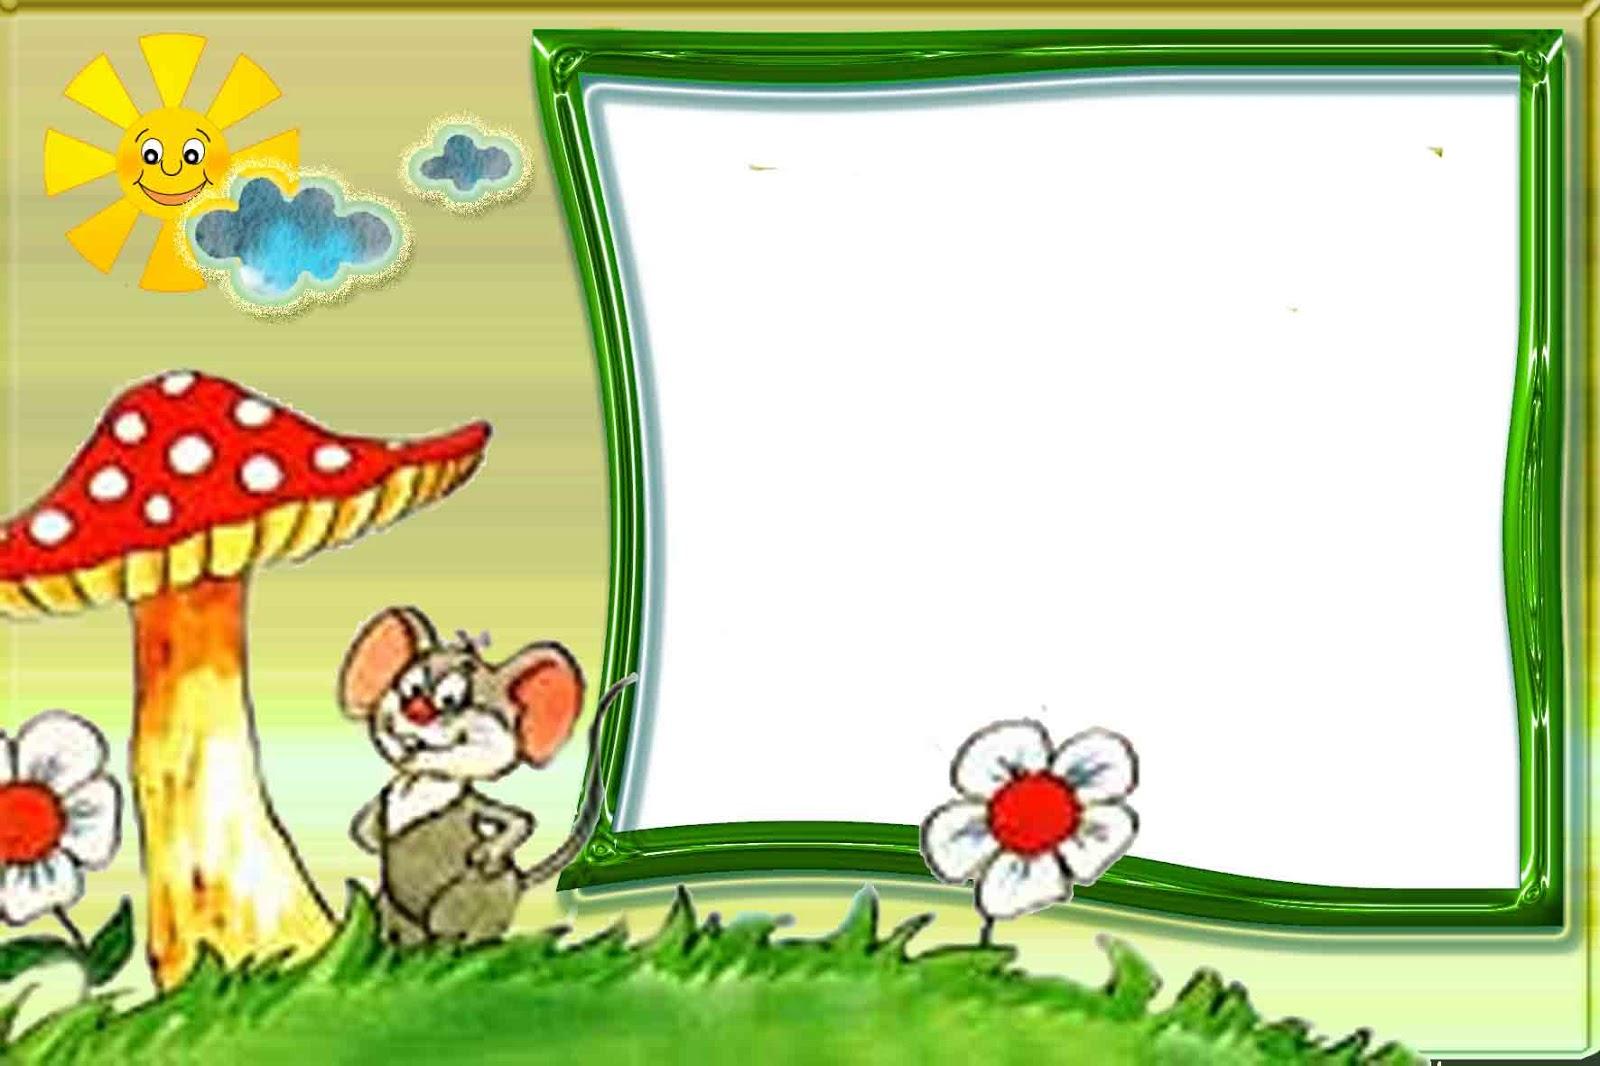 Photo Frame Design For Kids | www.imgkid.com - The Image ...